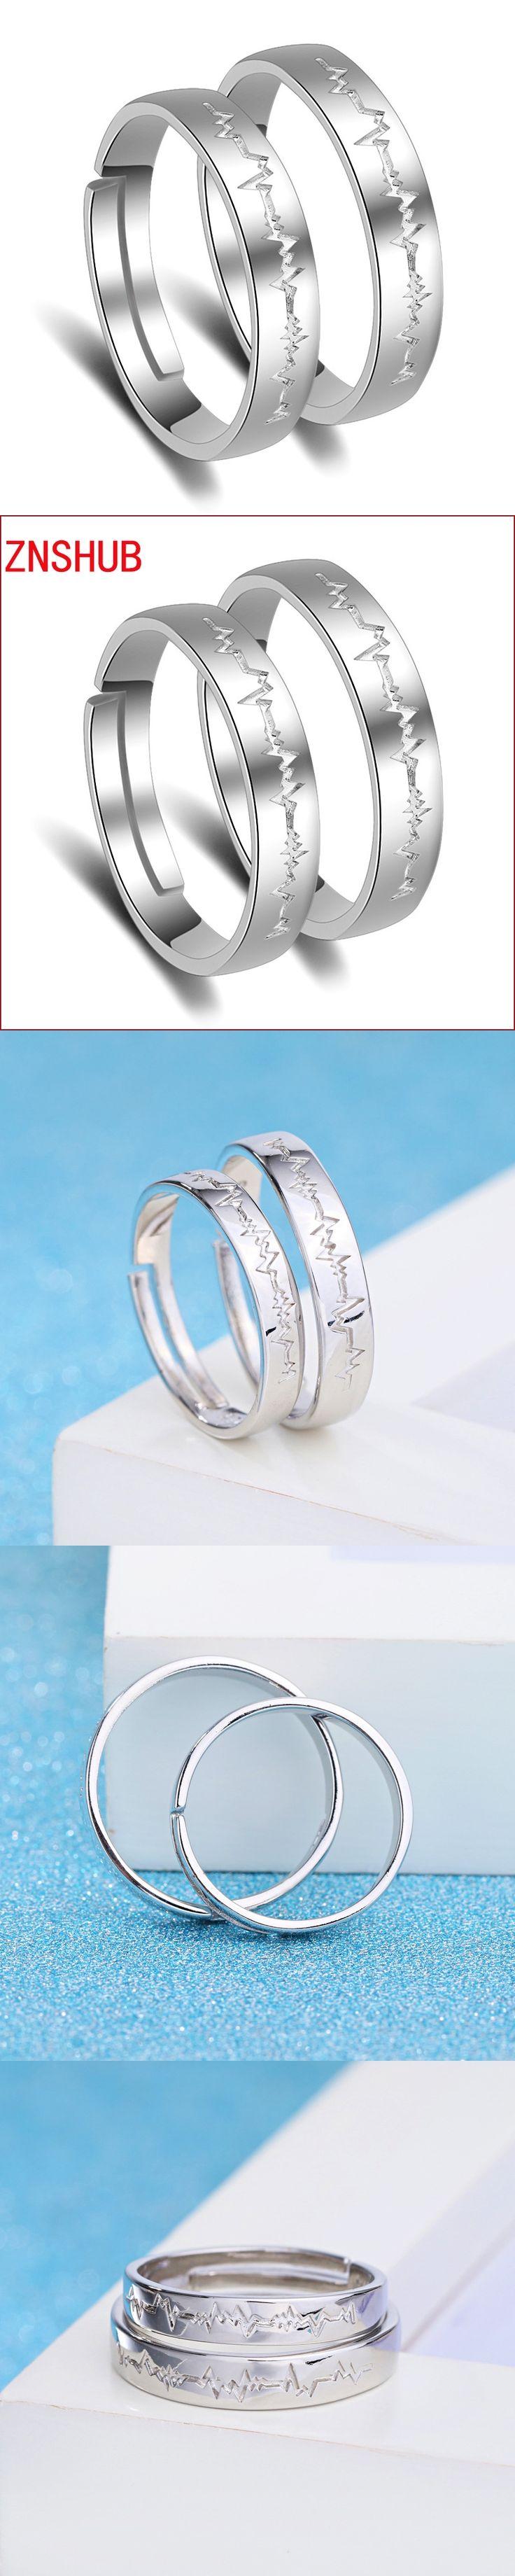 21 best Wedding & Engagement Jewelry images on Pinterest